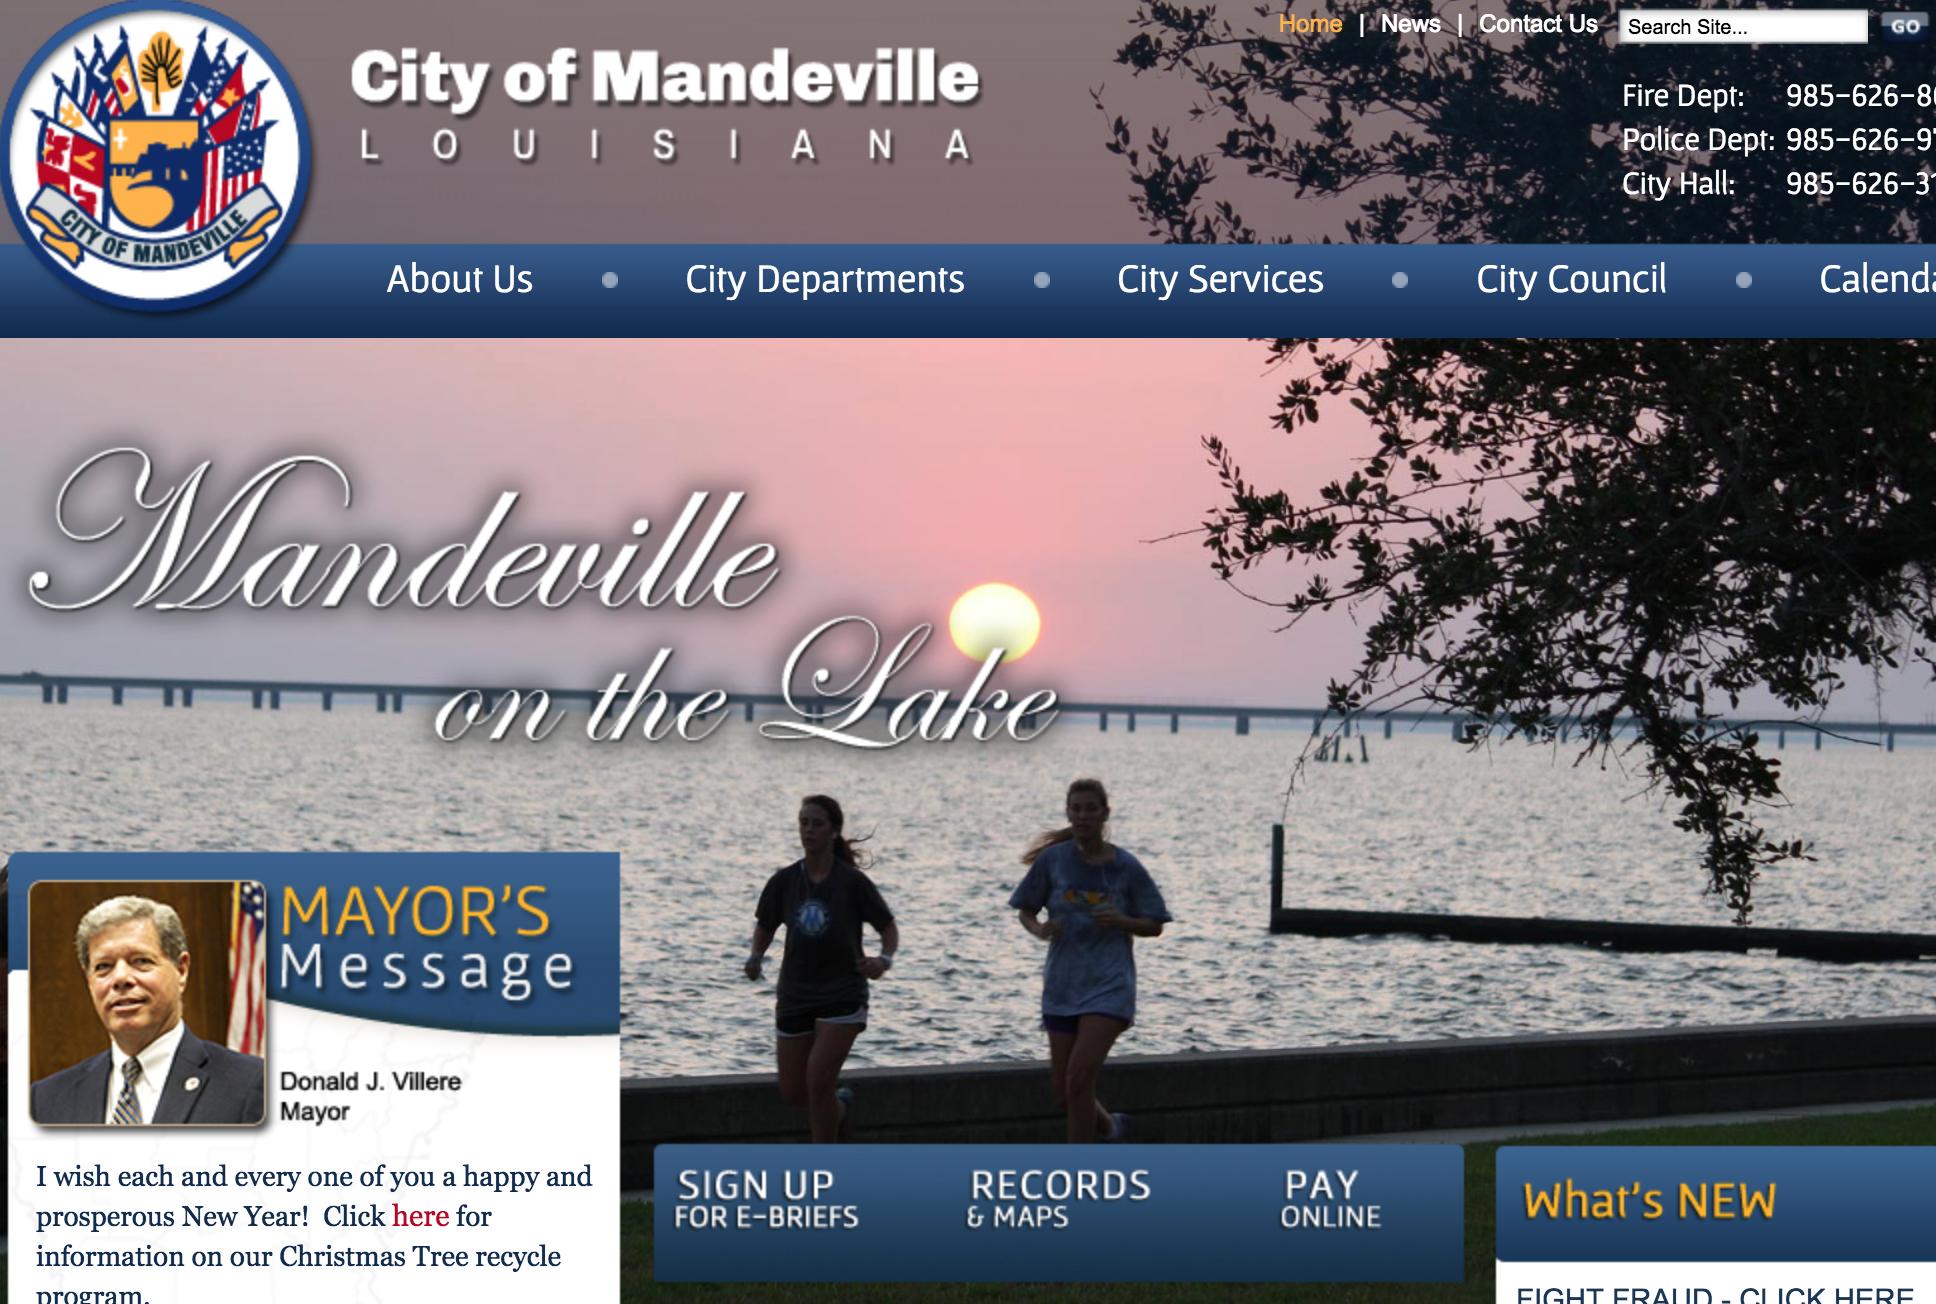 City of Mandeville